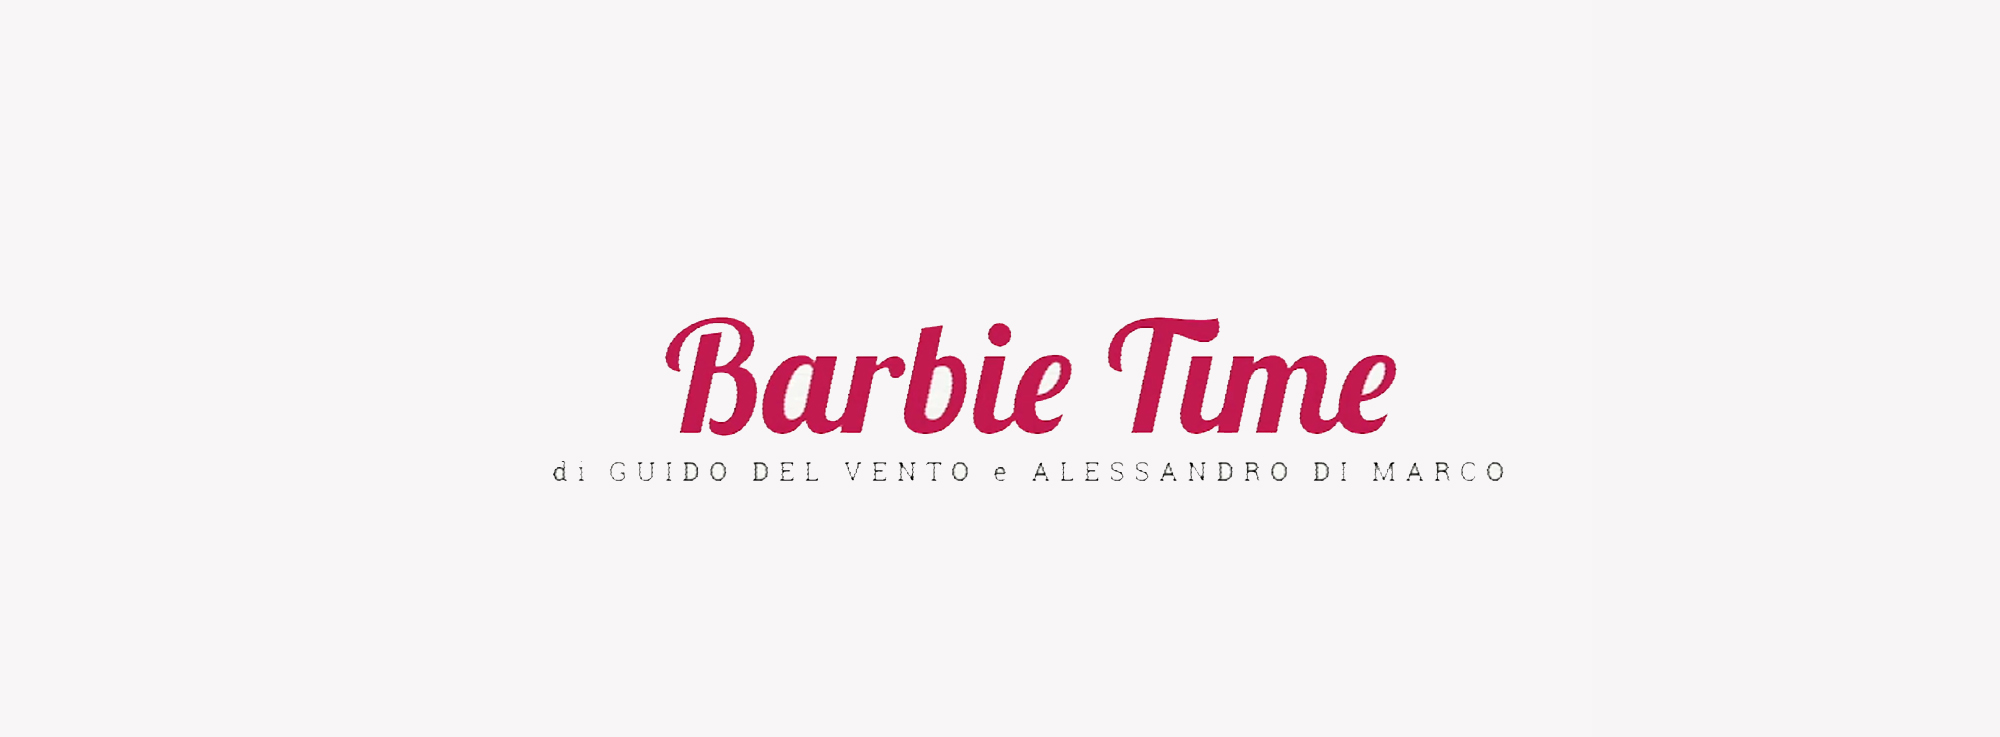 Foggia: Barbie Time